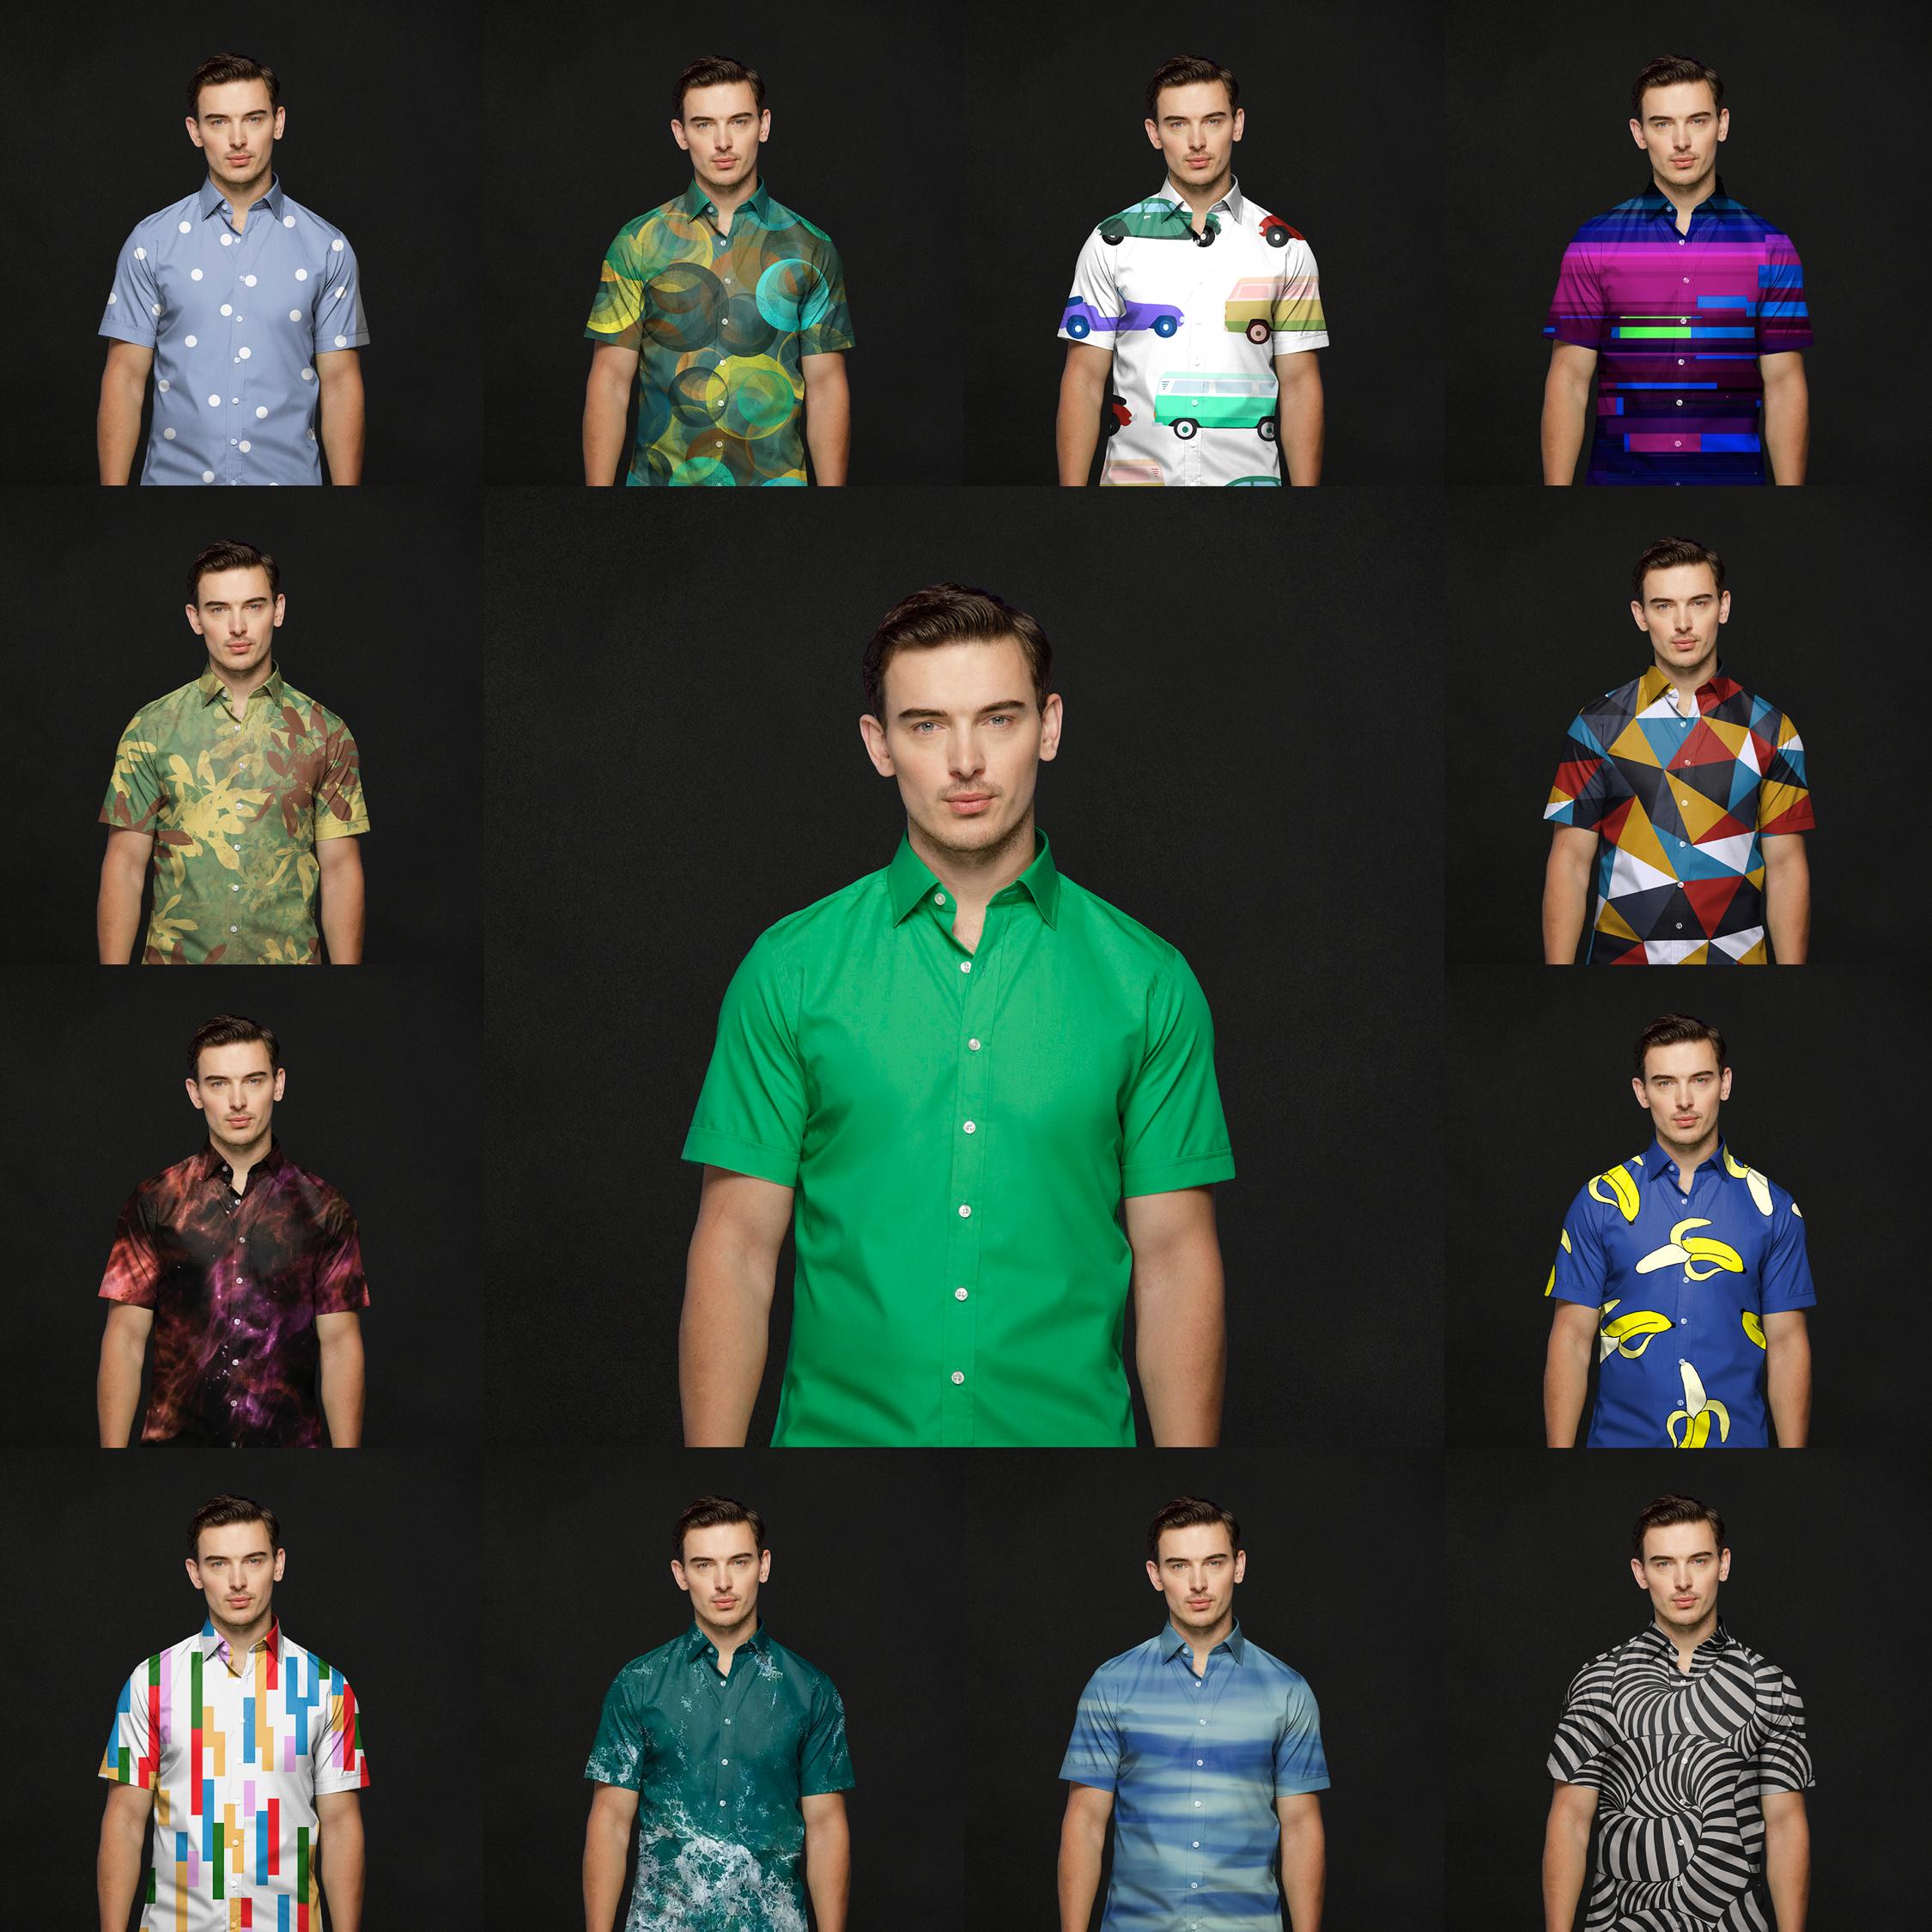 Harry Rosen's exclusive Green Screen Shirt designs